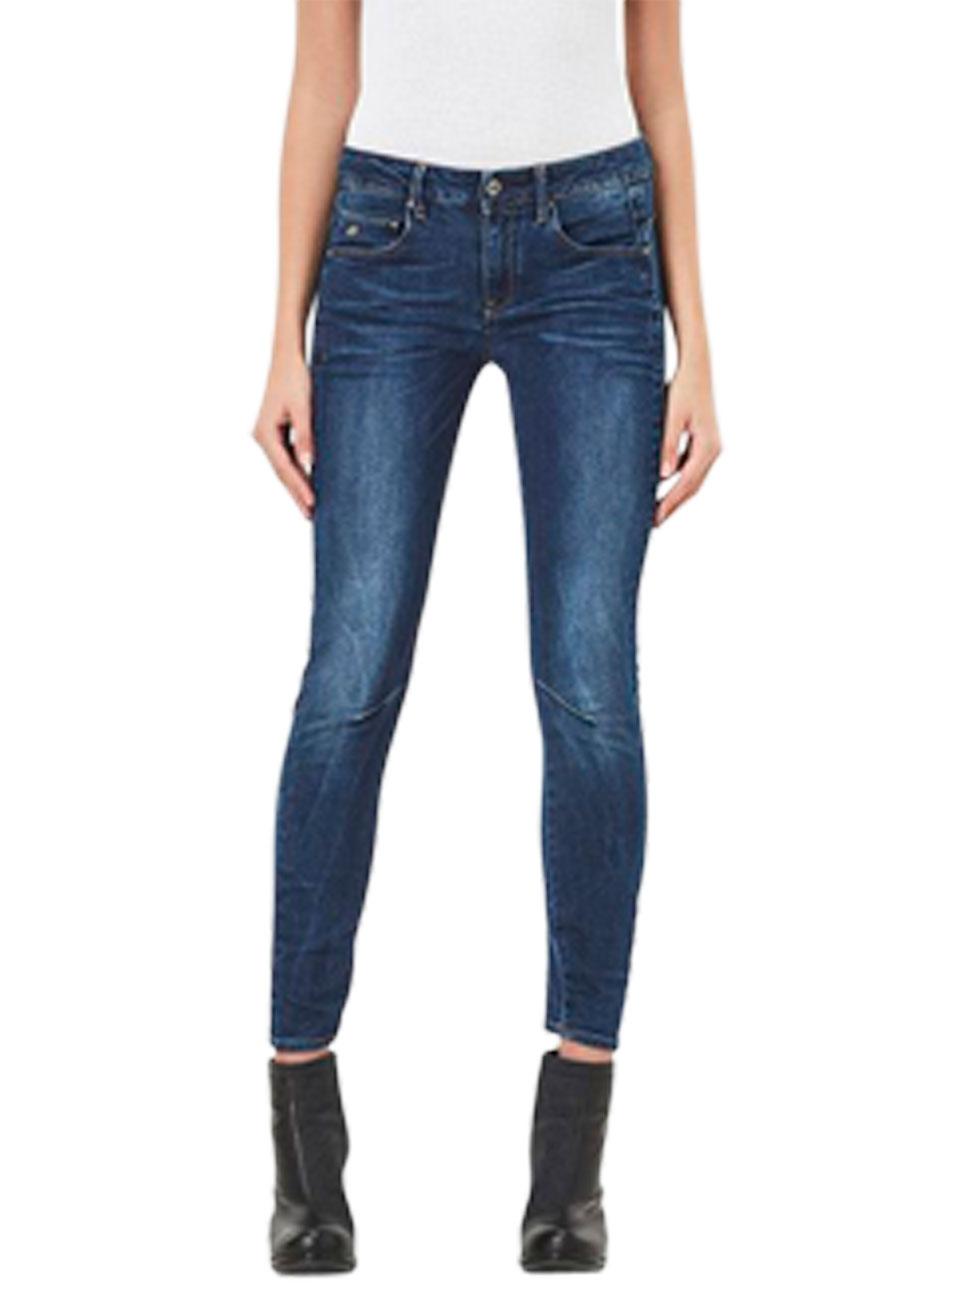 g star damen jeans arc 3d mid waist skinny fit blau medium aged kaufen jeans direct de. Black Bedroom Furniture Sets. Home Design Ideas